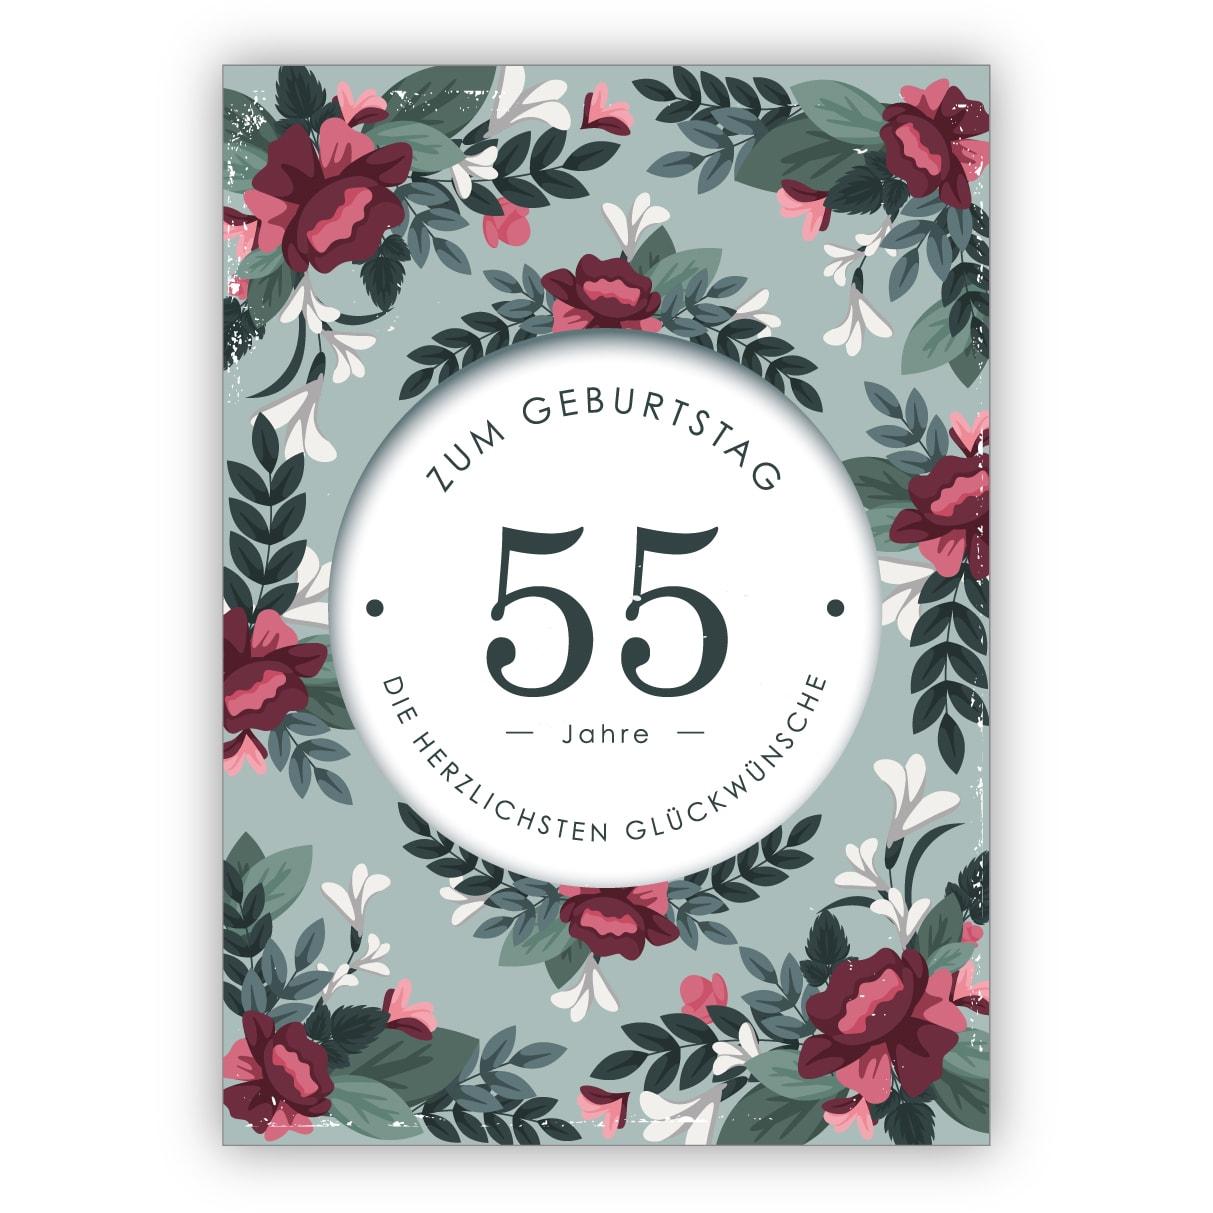 Bilder geburtstag 55 ▷ Geburtstag: